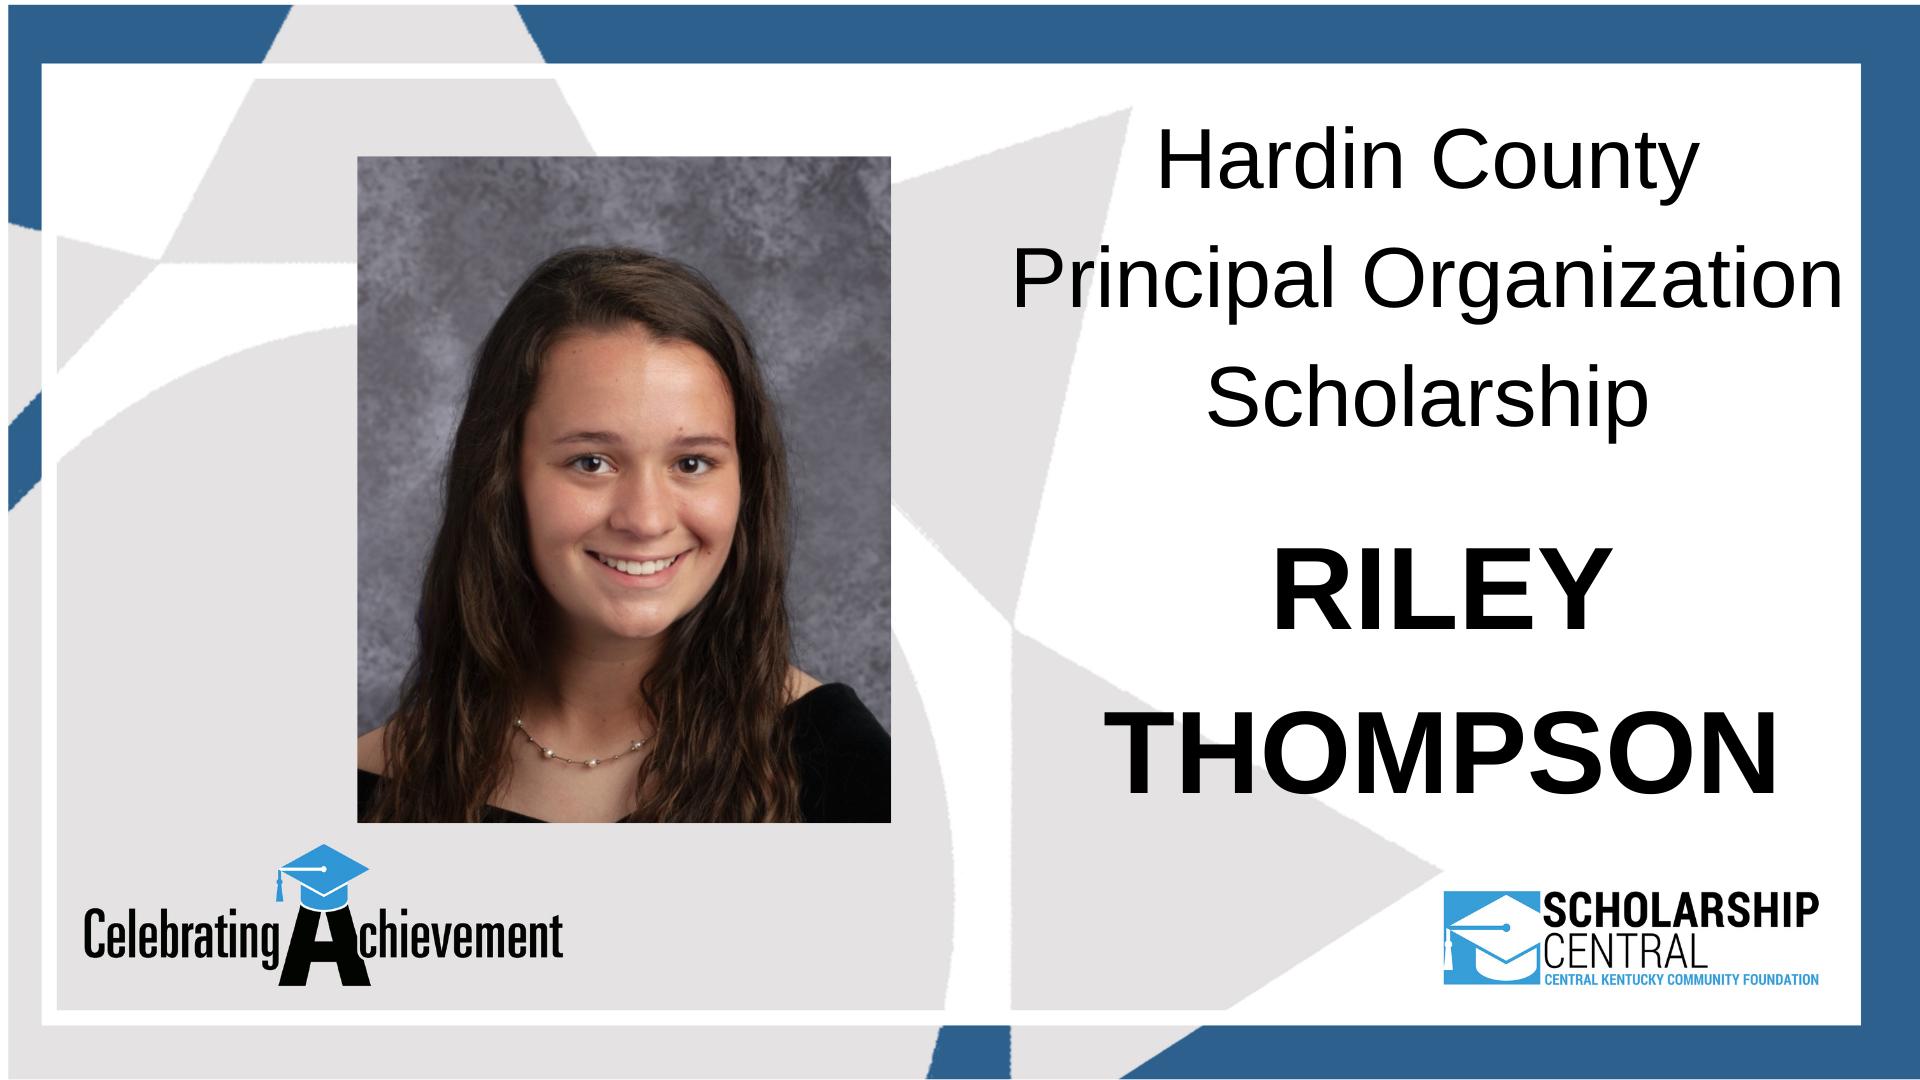 Hardin County Principal Organization Scholarship Winner